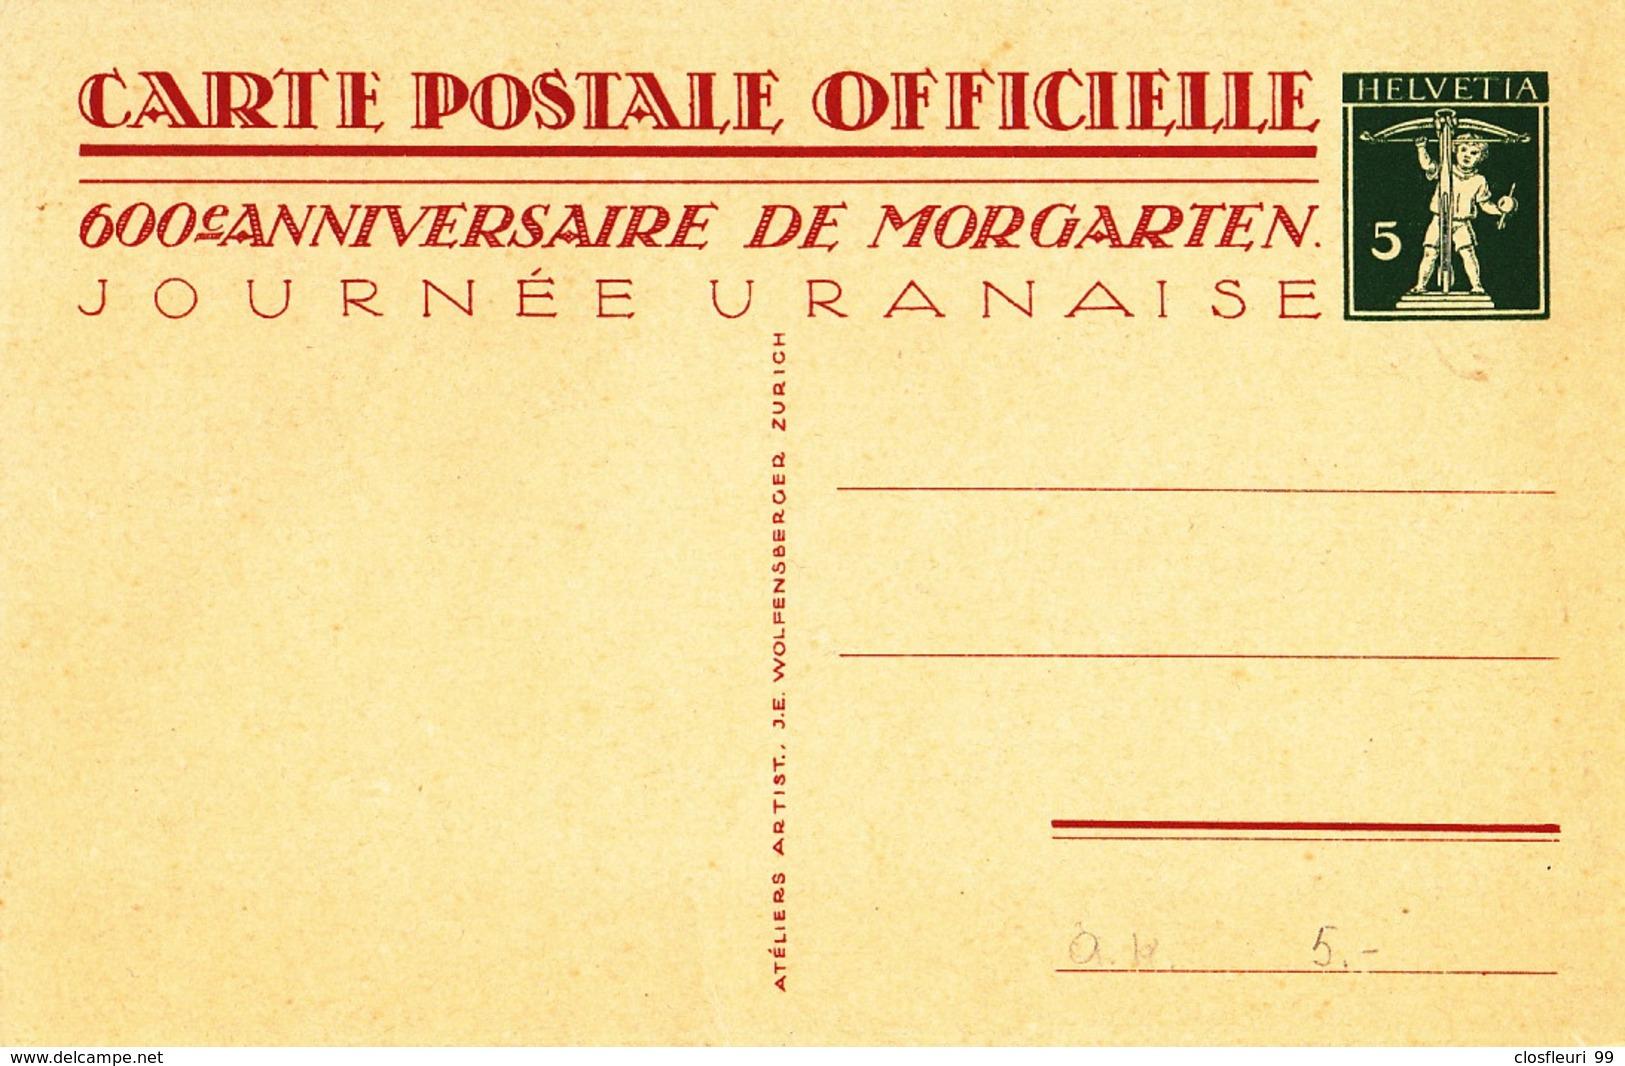 Carte Postale Officielle Anniversaire De Morgarten 1315-1915, Journée Uranaise ! - Stamped Stationery